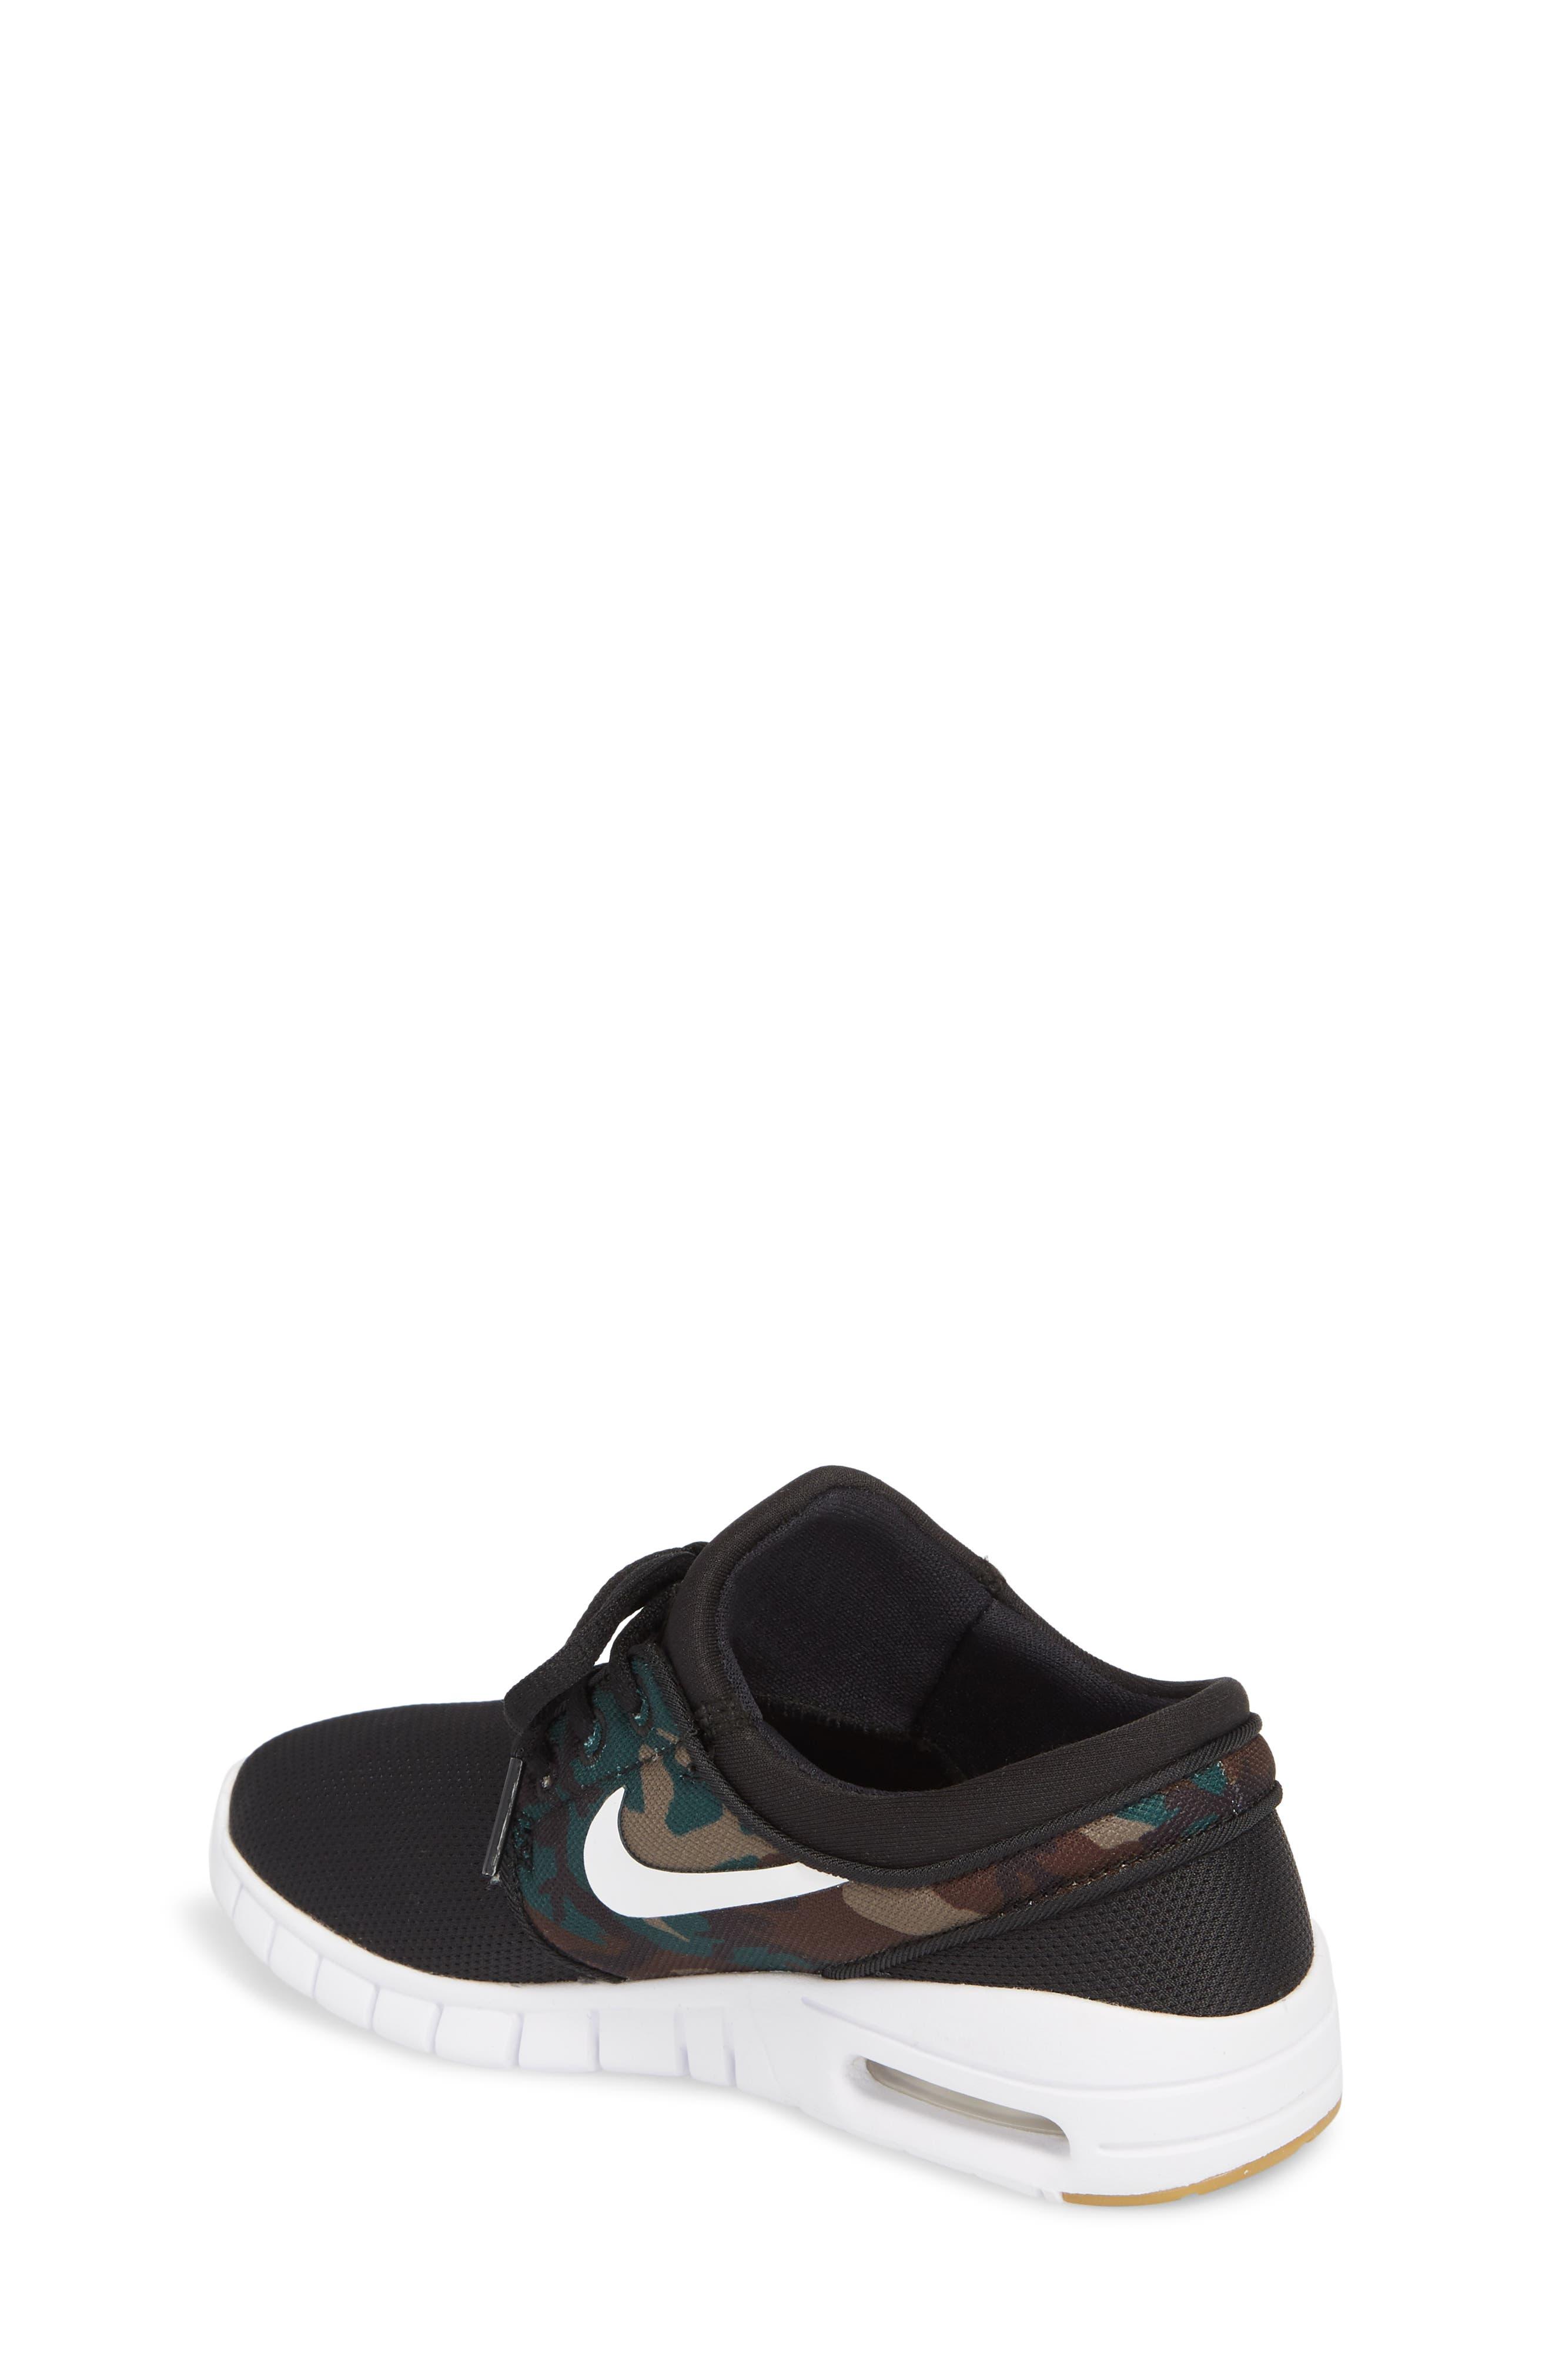 Stefan Janoski Max SB Skate Sneaker,                             Alternate thumbnail 2, color,                             Black/ White/ Olive/ Brown